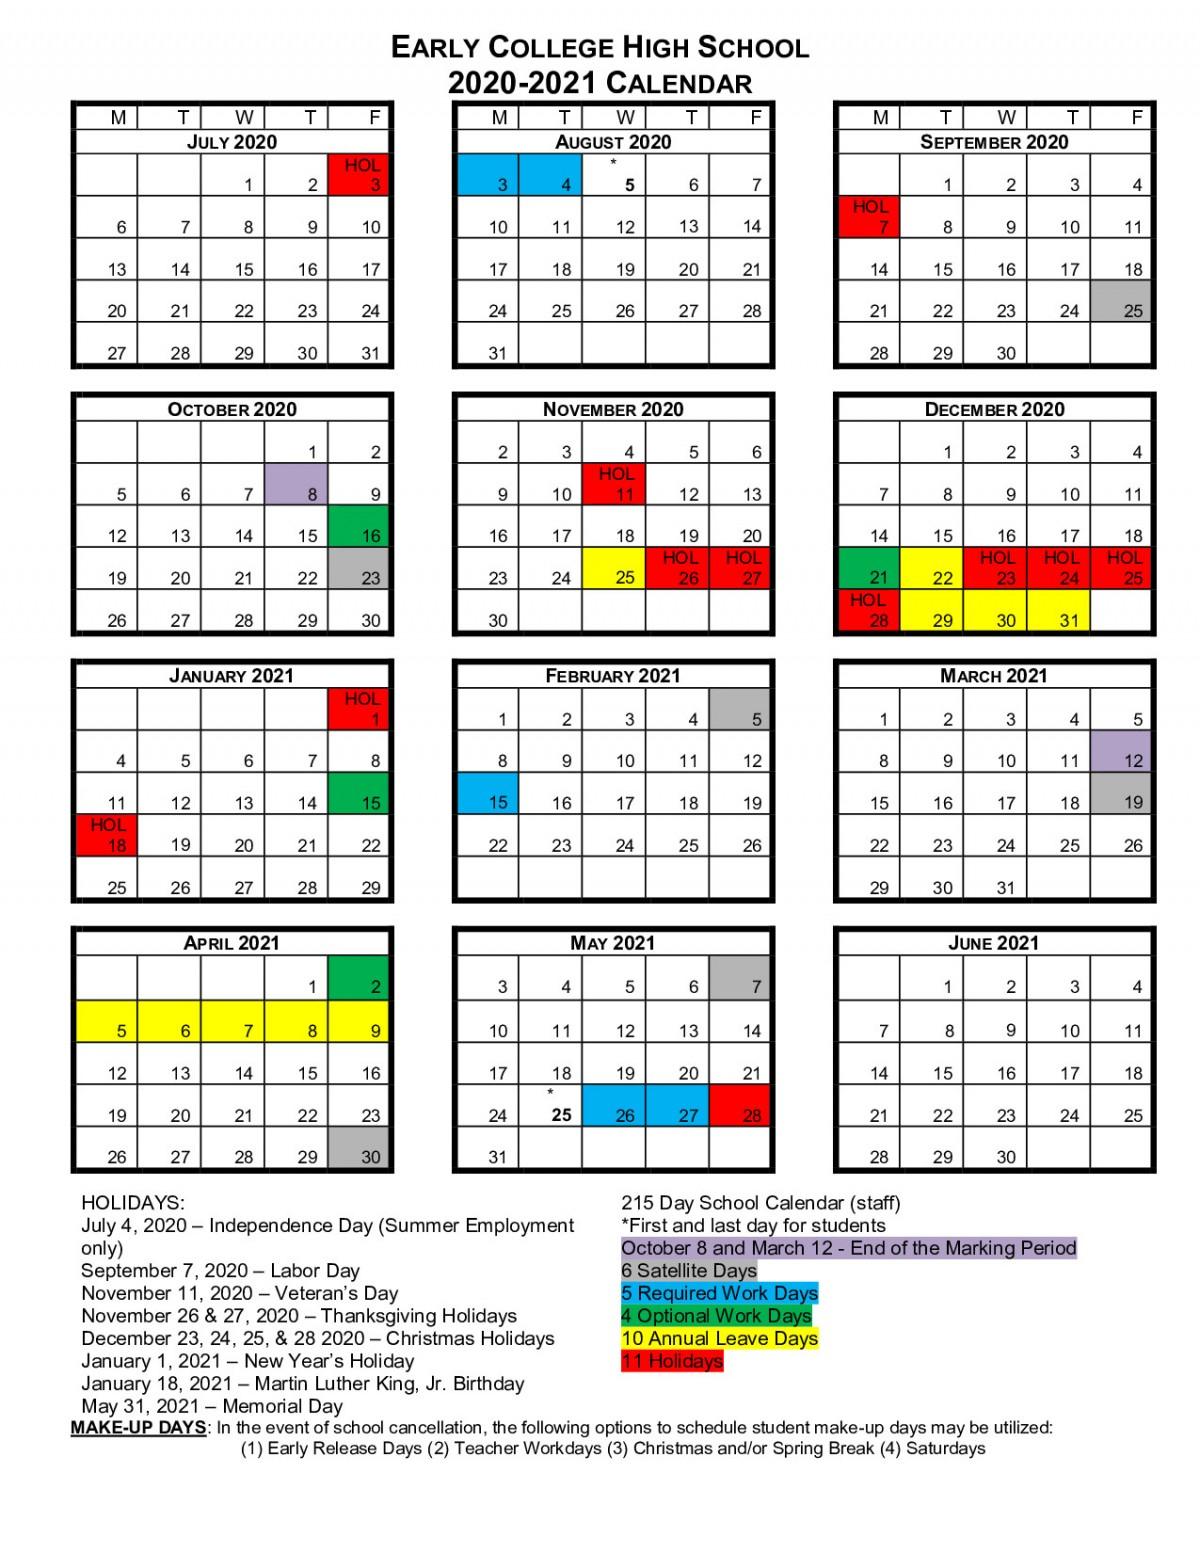 Bcs School Calendars   Beaufort County Schools Intended For Houston Countyboard Of Education Calendar 2021